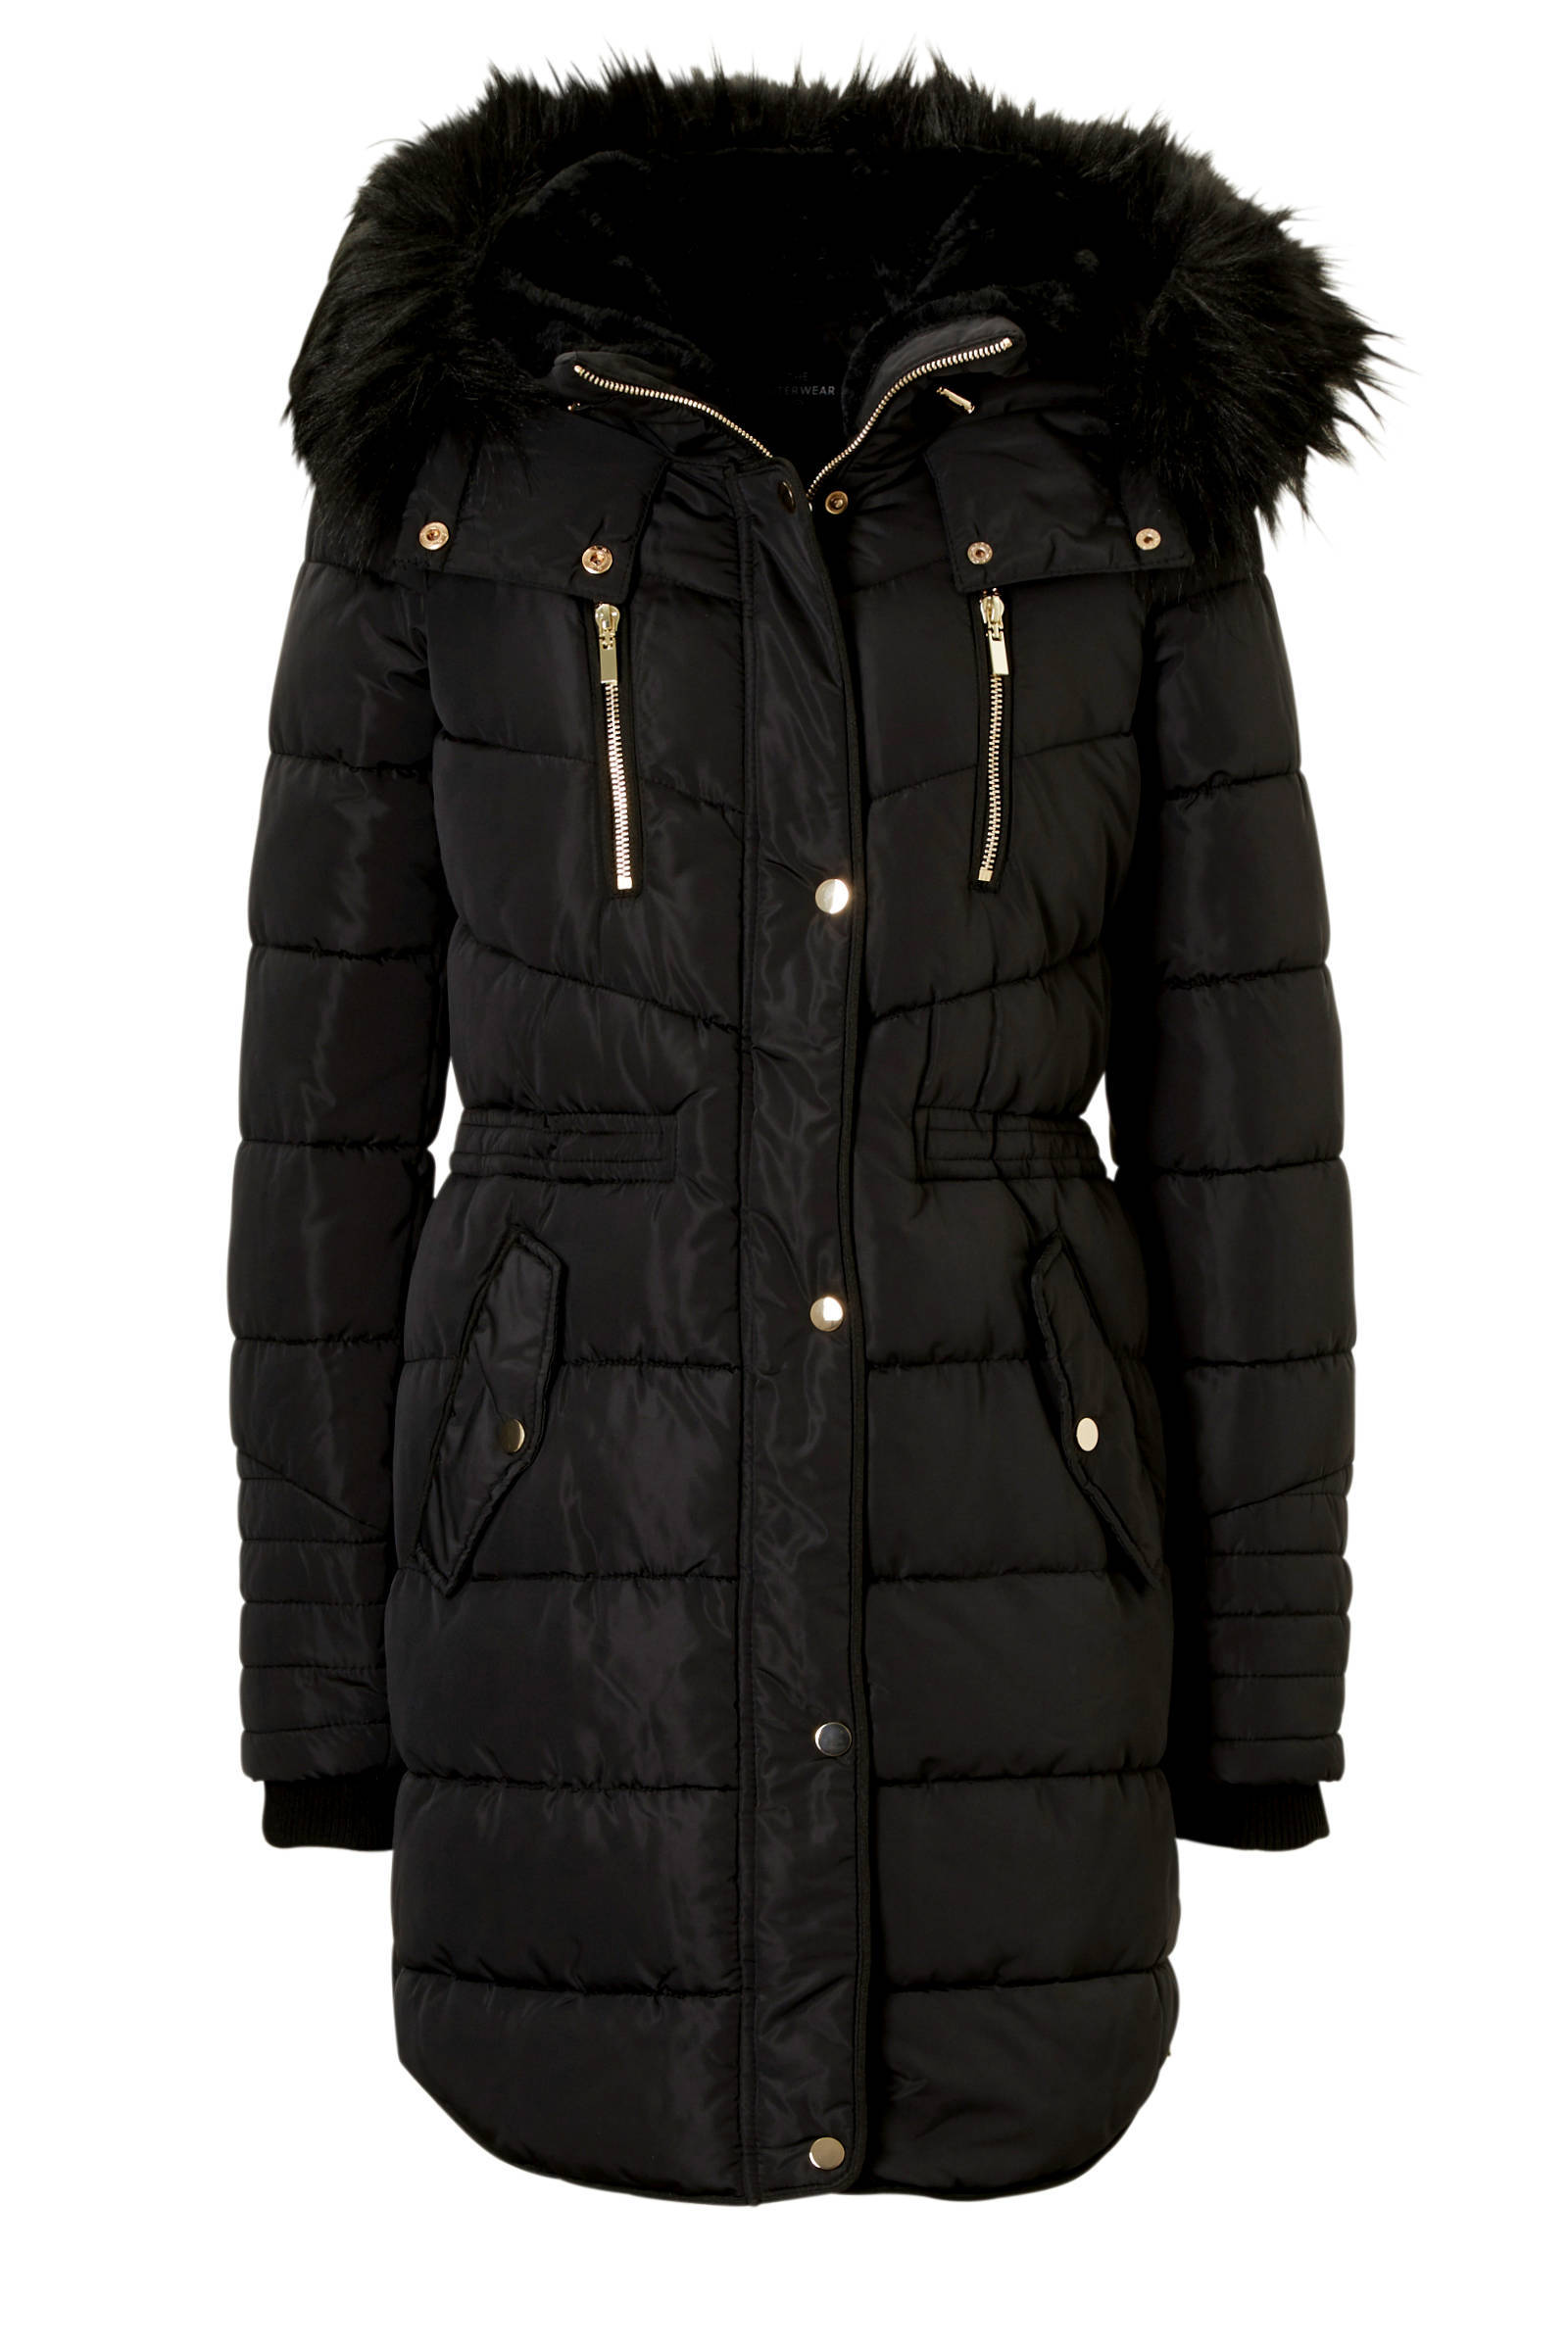 vrouwen winterjassen